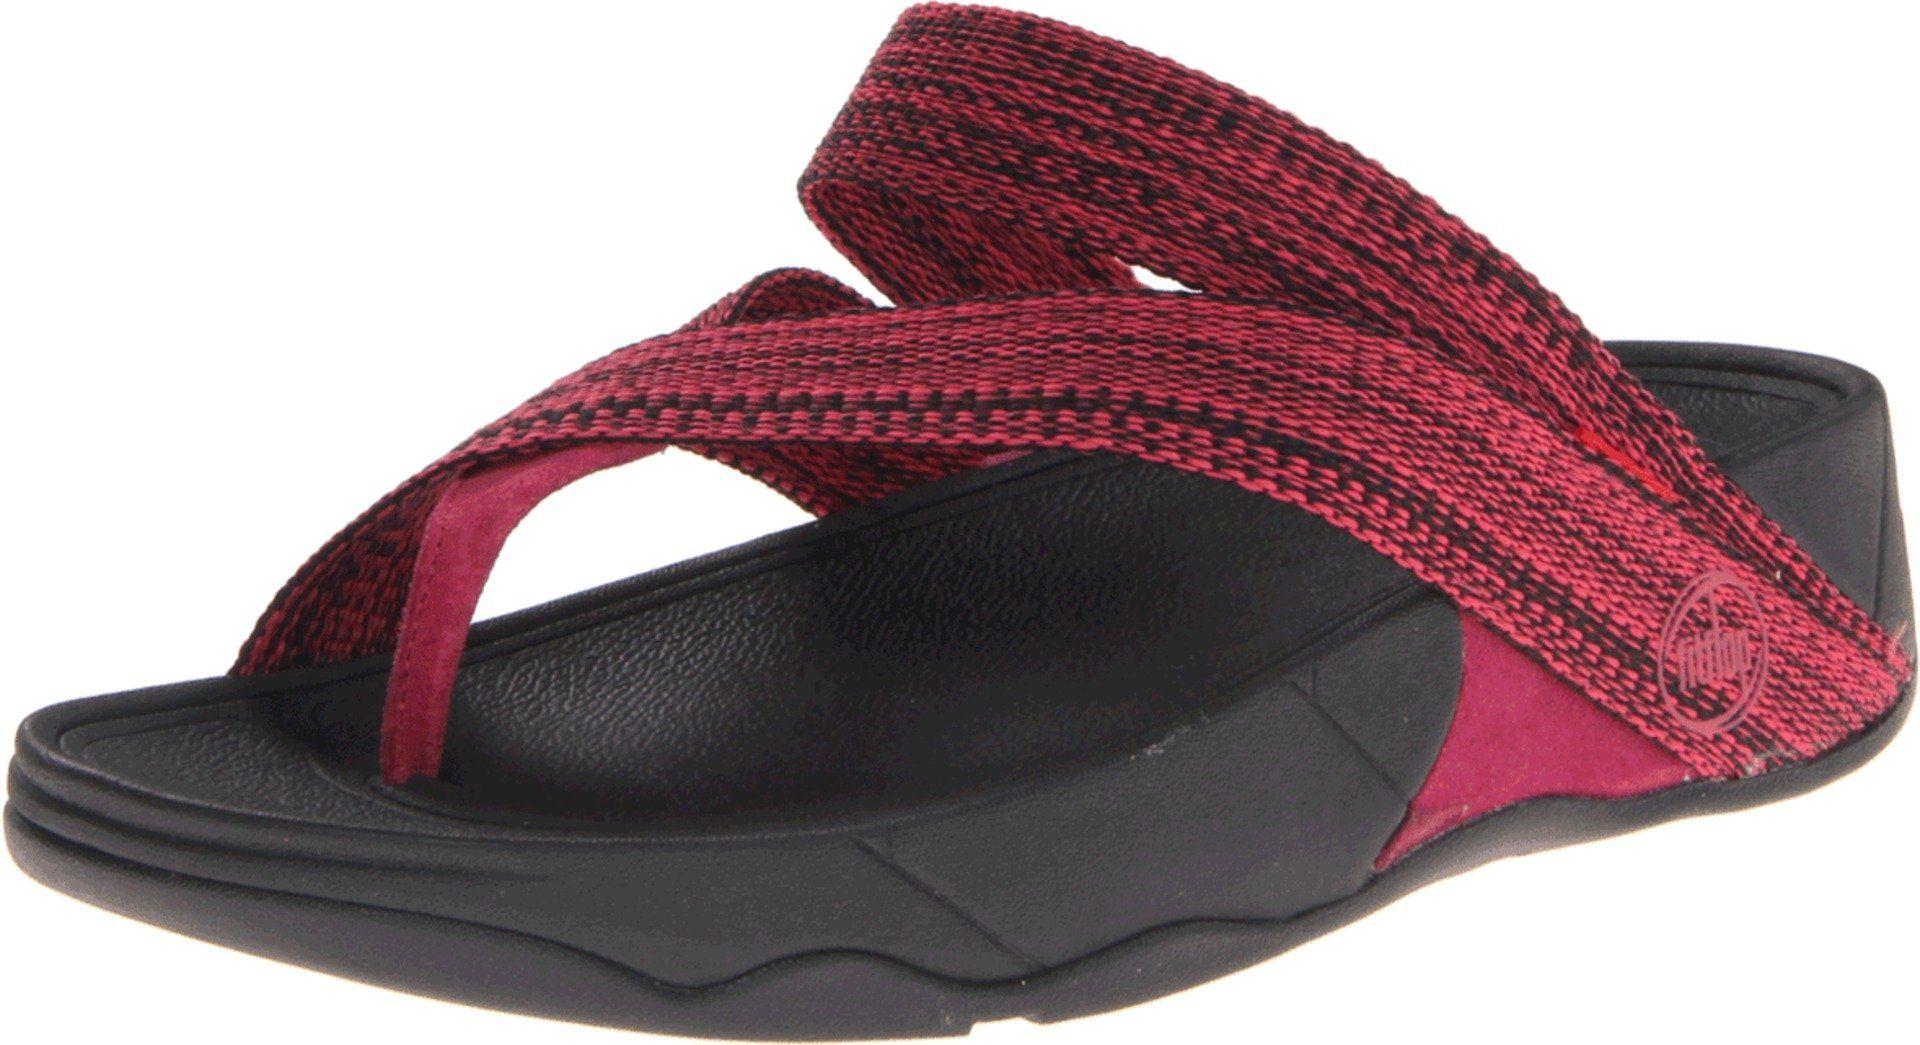 d5bb7afa13161 FitFlop Women s Sling Webbing Thong Sandal